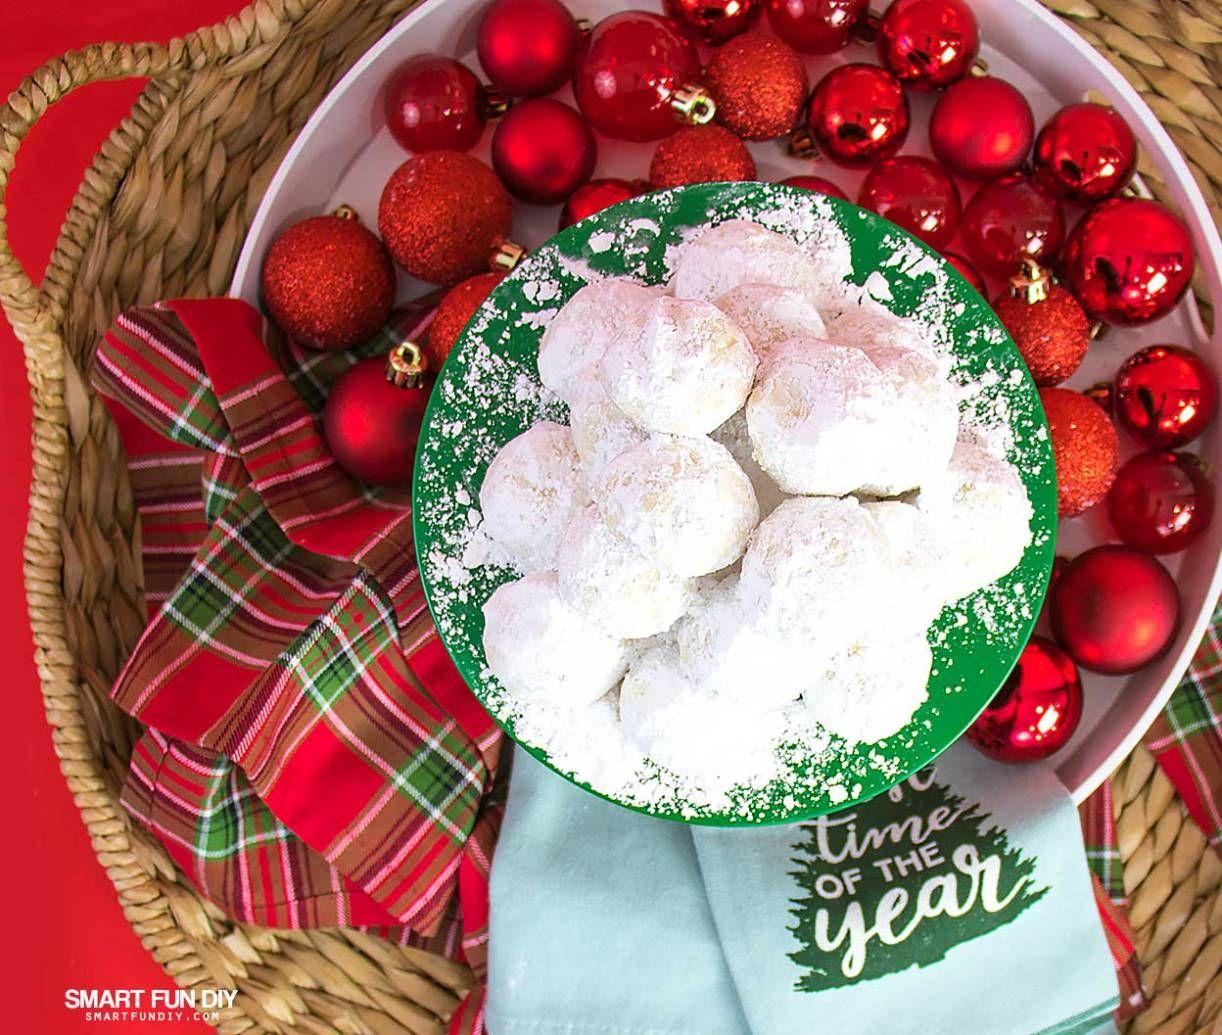 Mexican Wedding Cakes Recipe (or Russian Tea Cakes